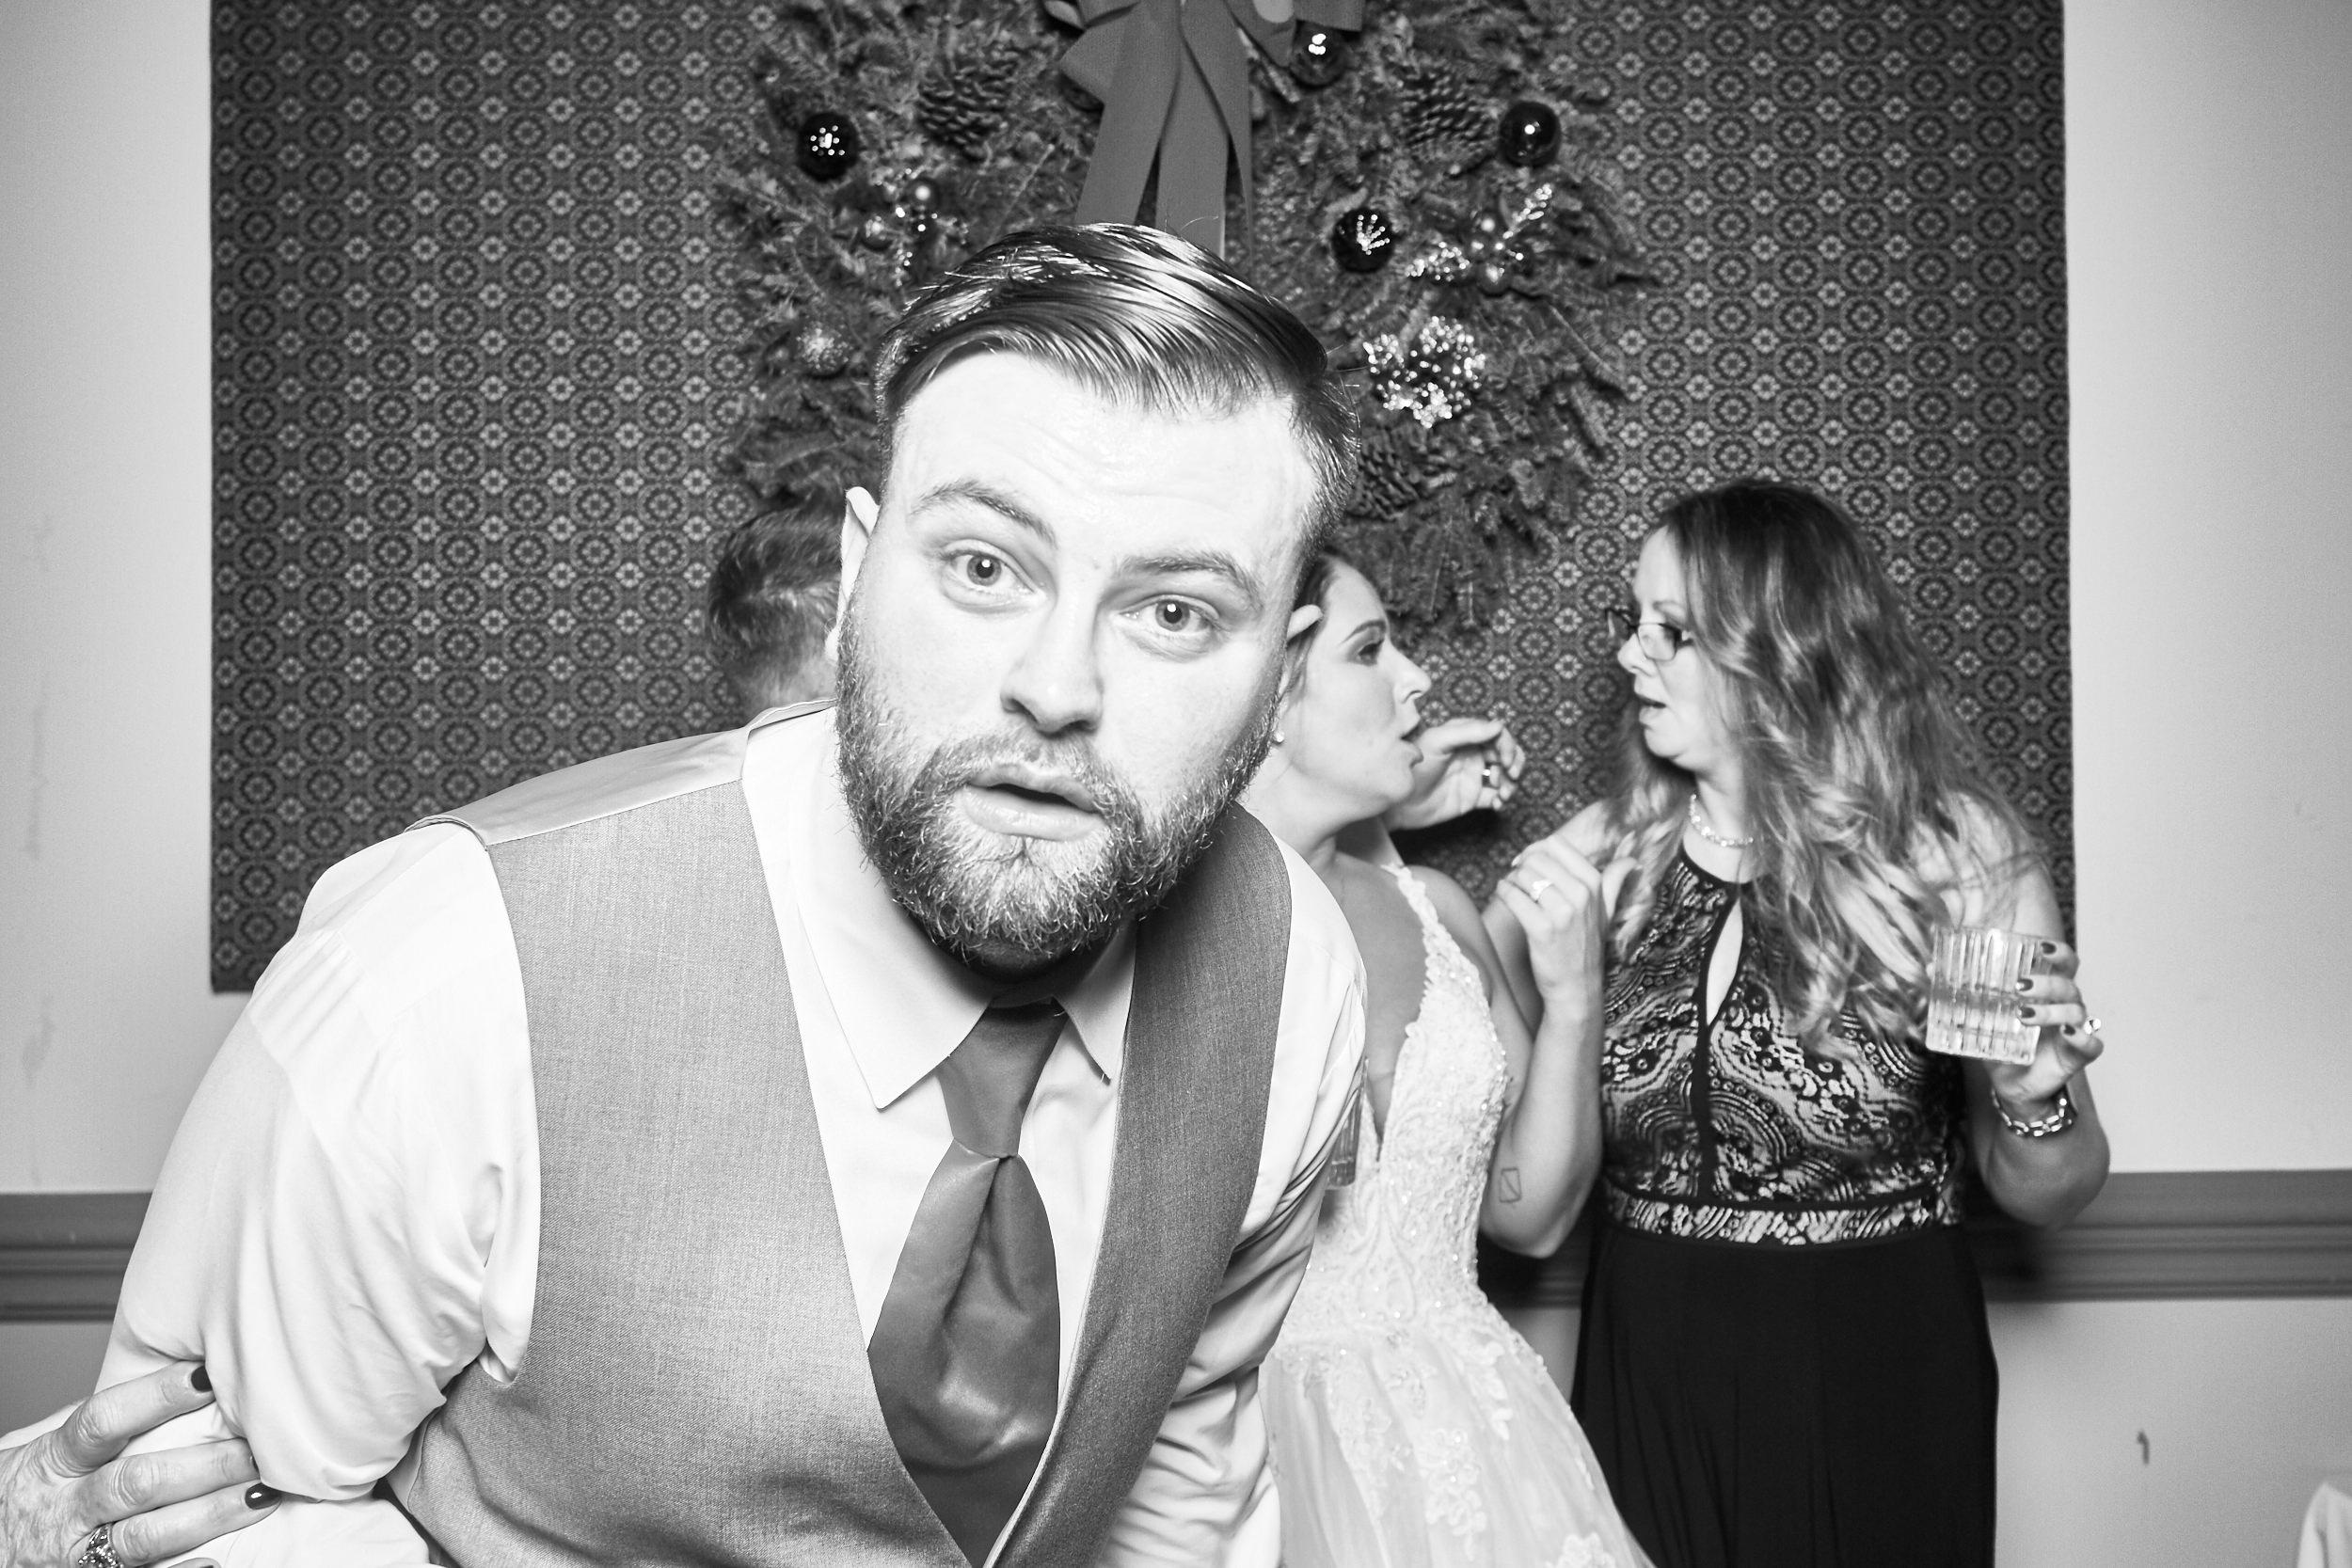 Alexa-James-Wedding-Photo-Booth983.jpg